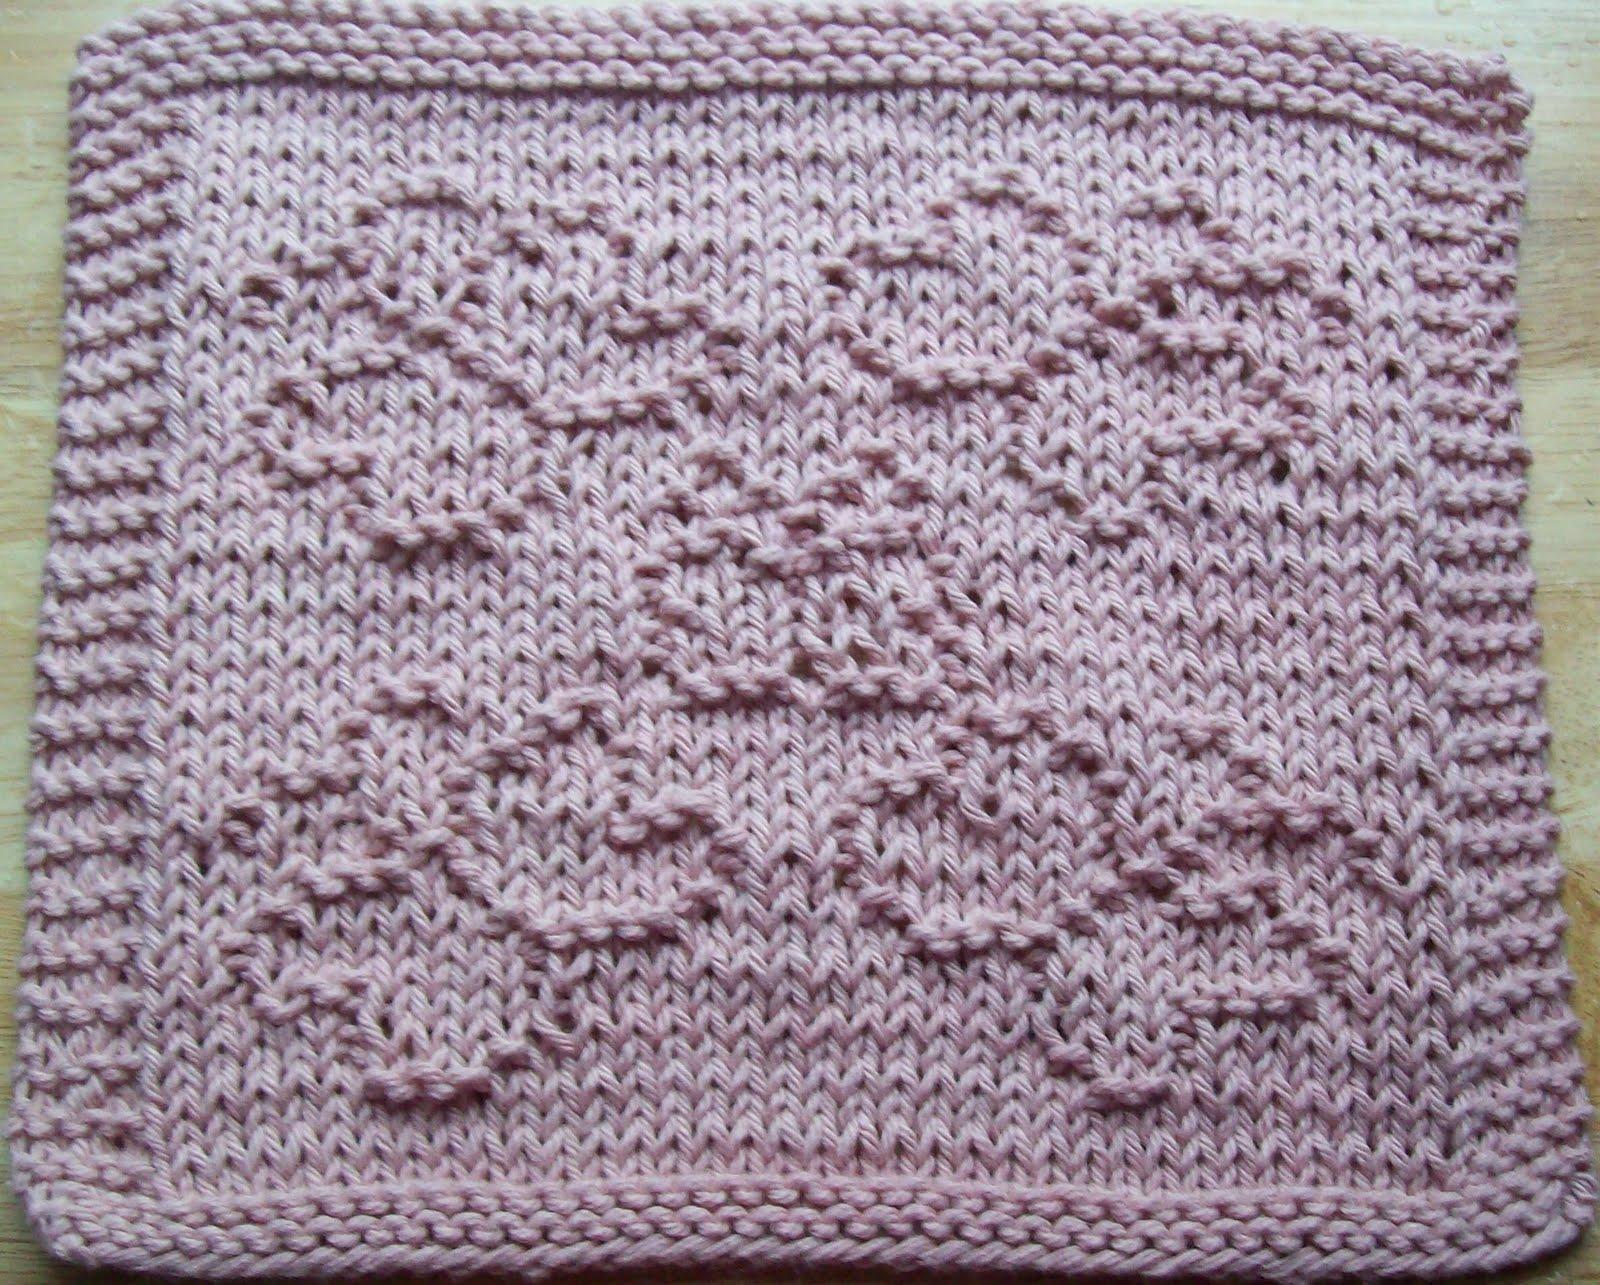 DigKnitty Designs: More Butterflies Knit Dishcloth Pattern